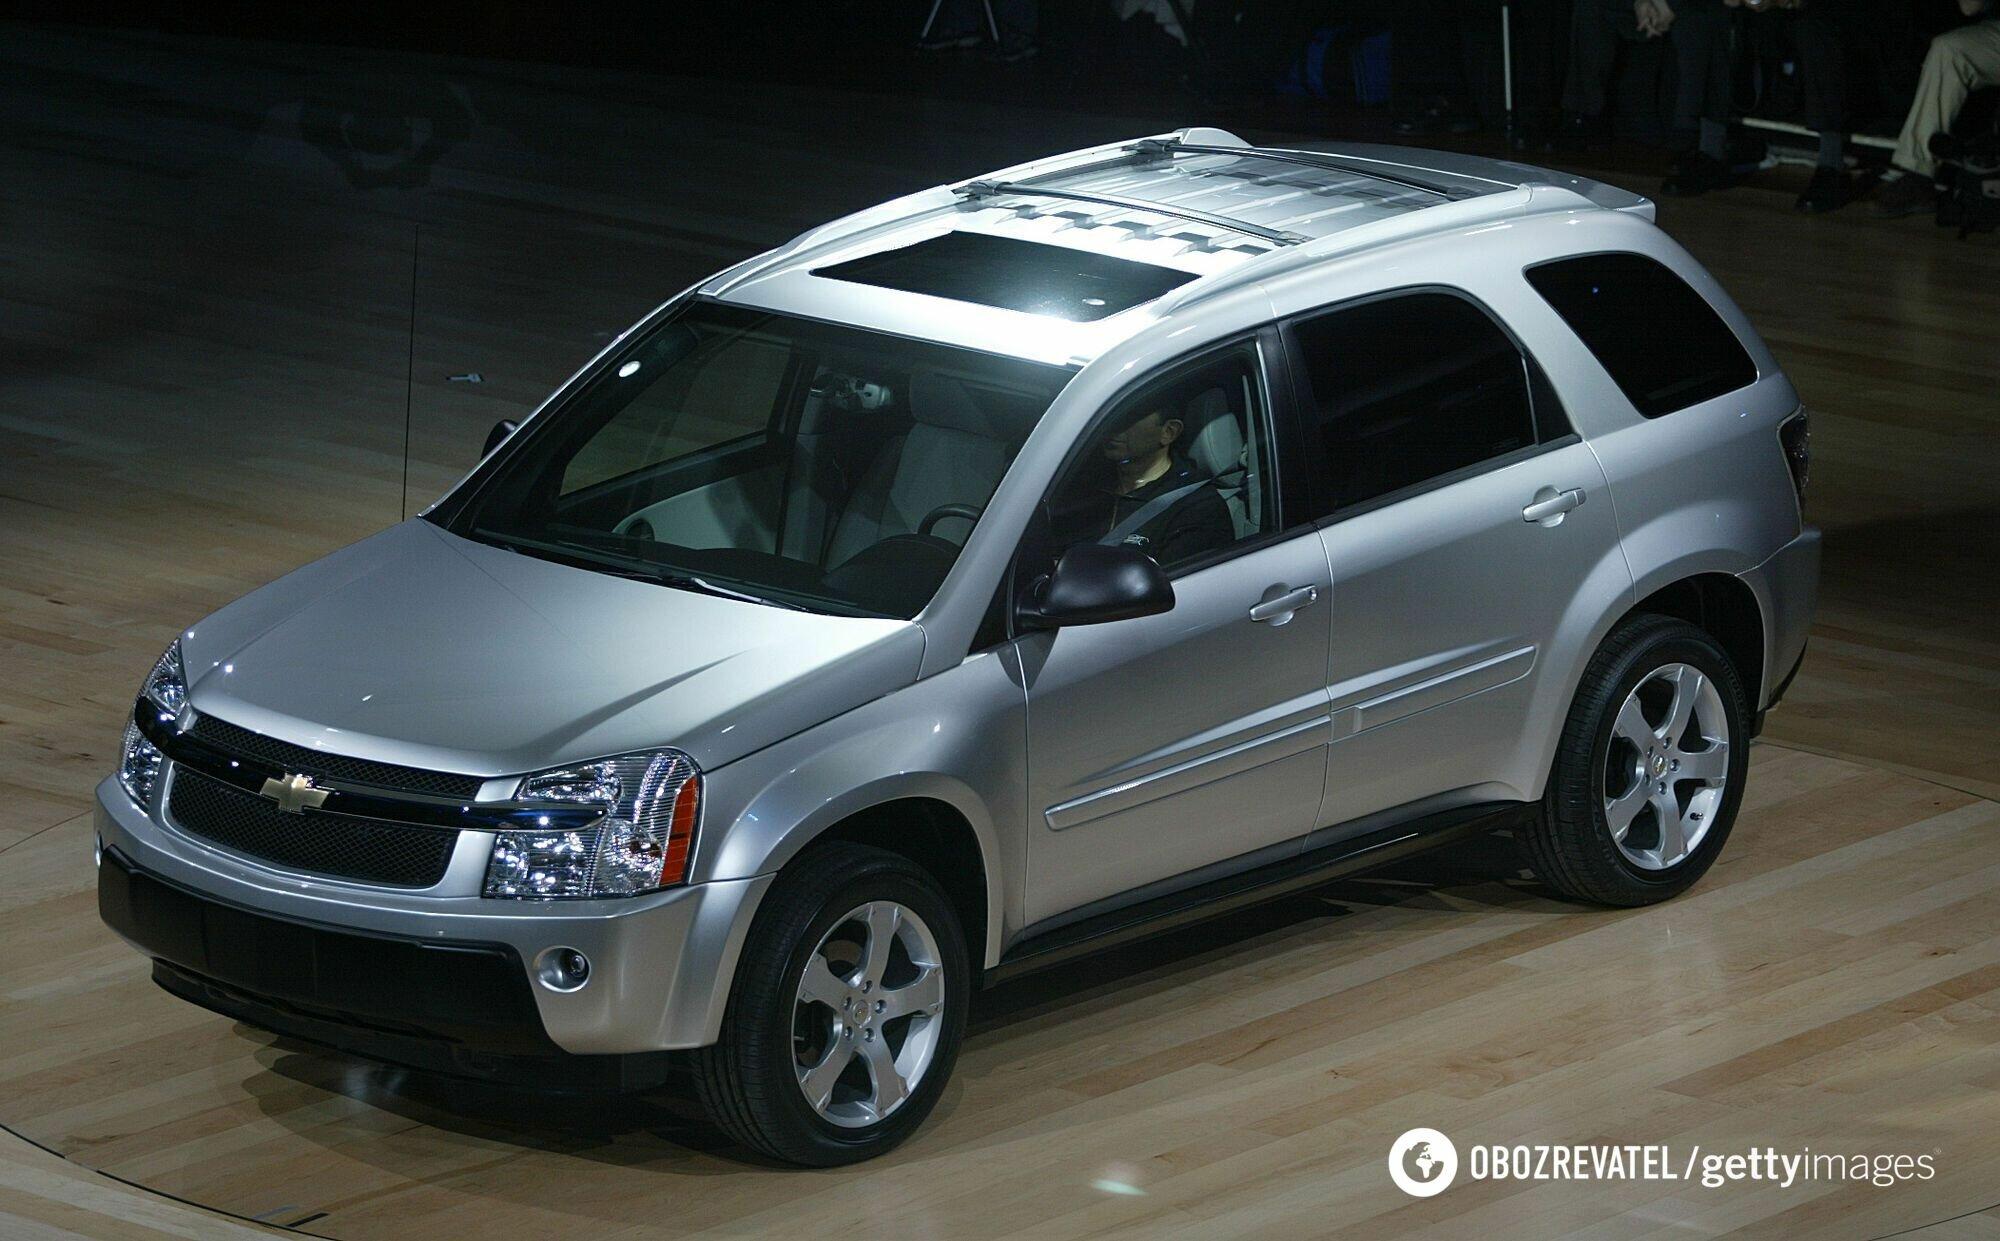 Chevrolet Equinox 2005 года выпуска